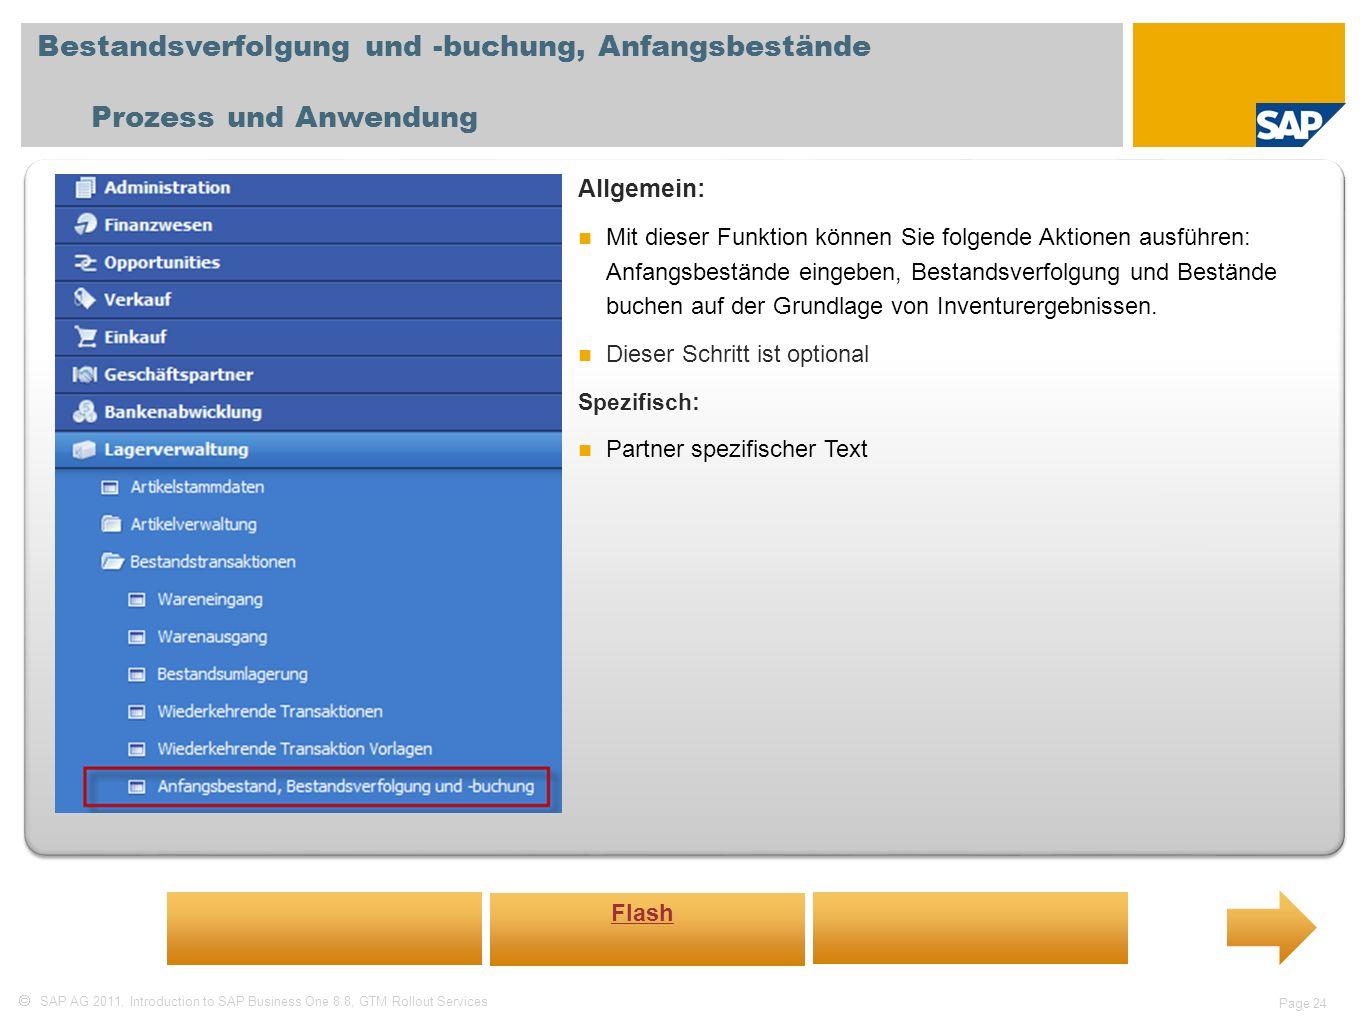 SAP AG 2011, Introduction to SAP Business One 8.8, GTM Rollout Services Page 24 Bestandsverfolgung und -buchung, Anfangsbestände Prozess und Anwendung